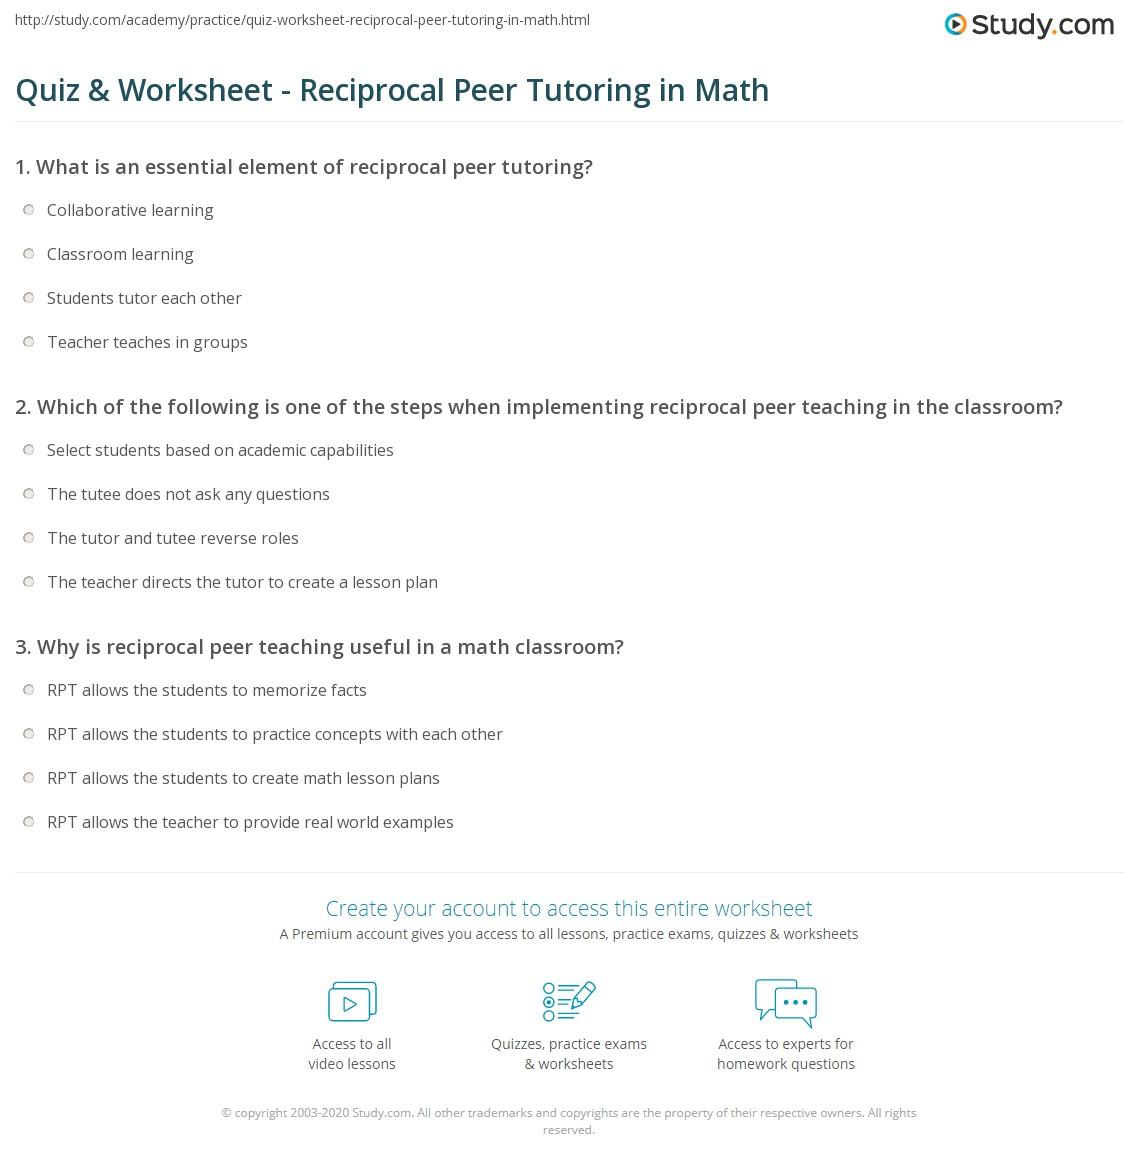 Quiz & Worksheet - Reciprocal Peer Tutoring in Math | Study.com